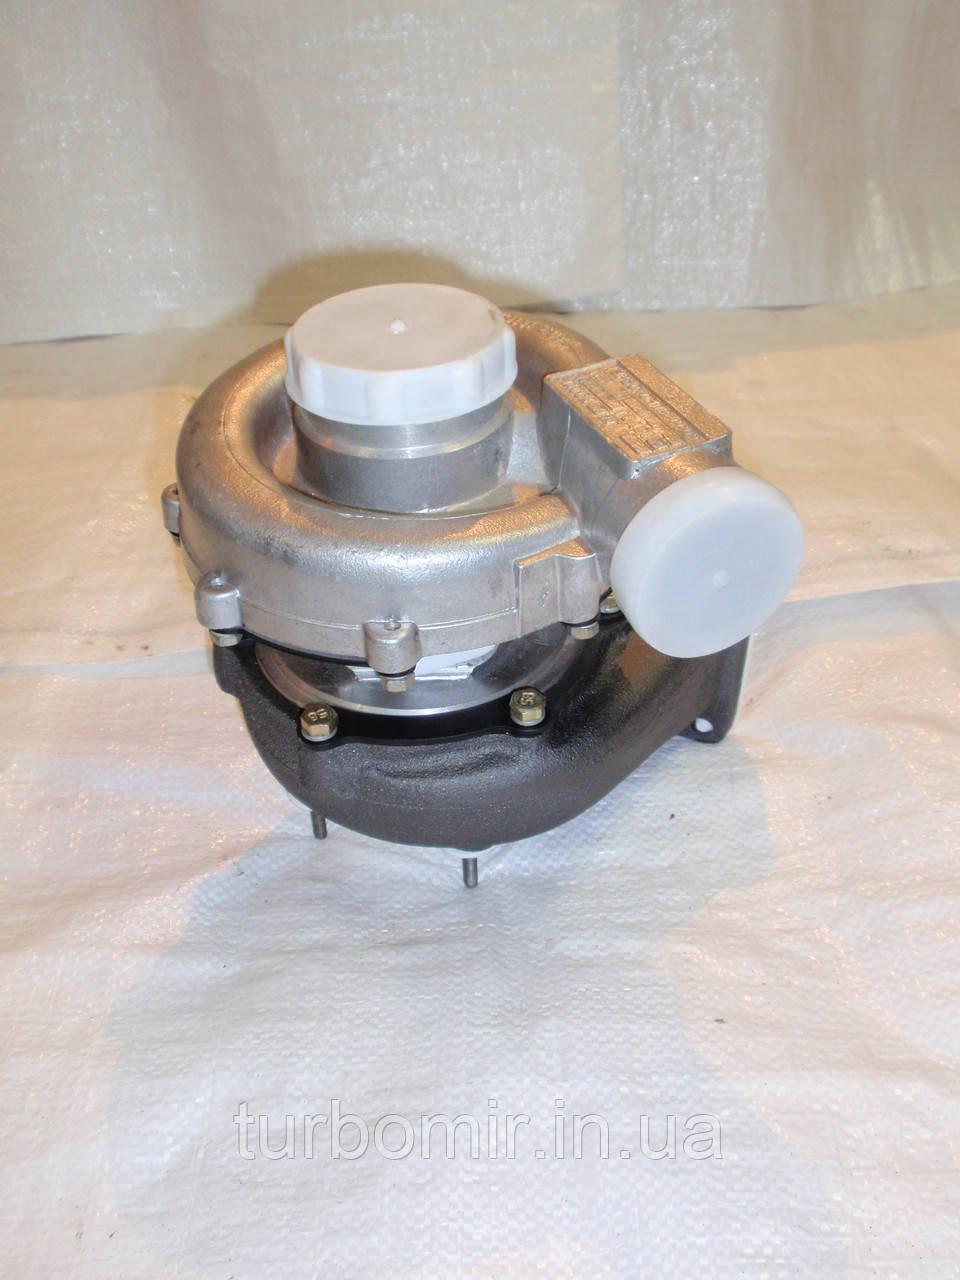 Турбокомпрессор (турбина) ТКР 7H6 (комбайн Енисей)